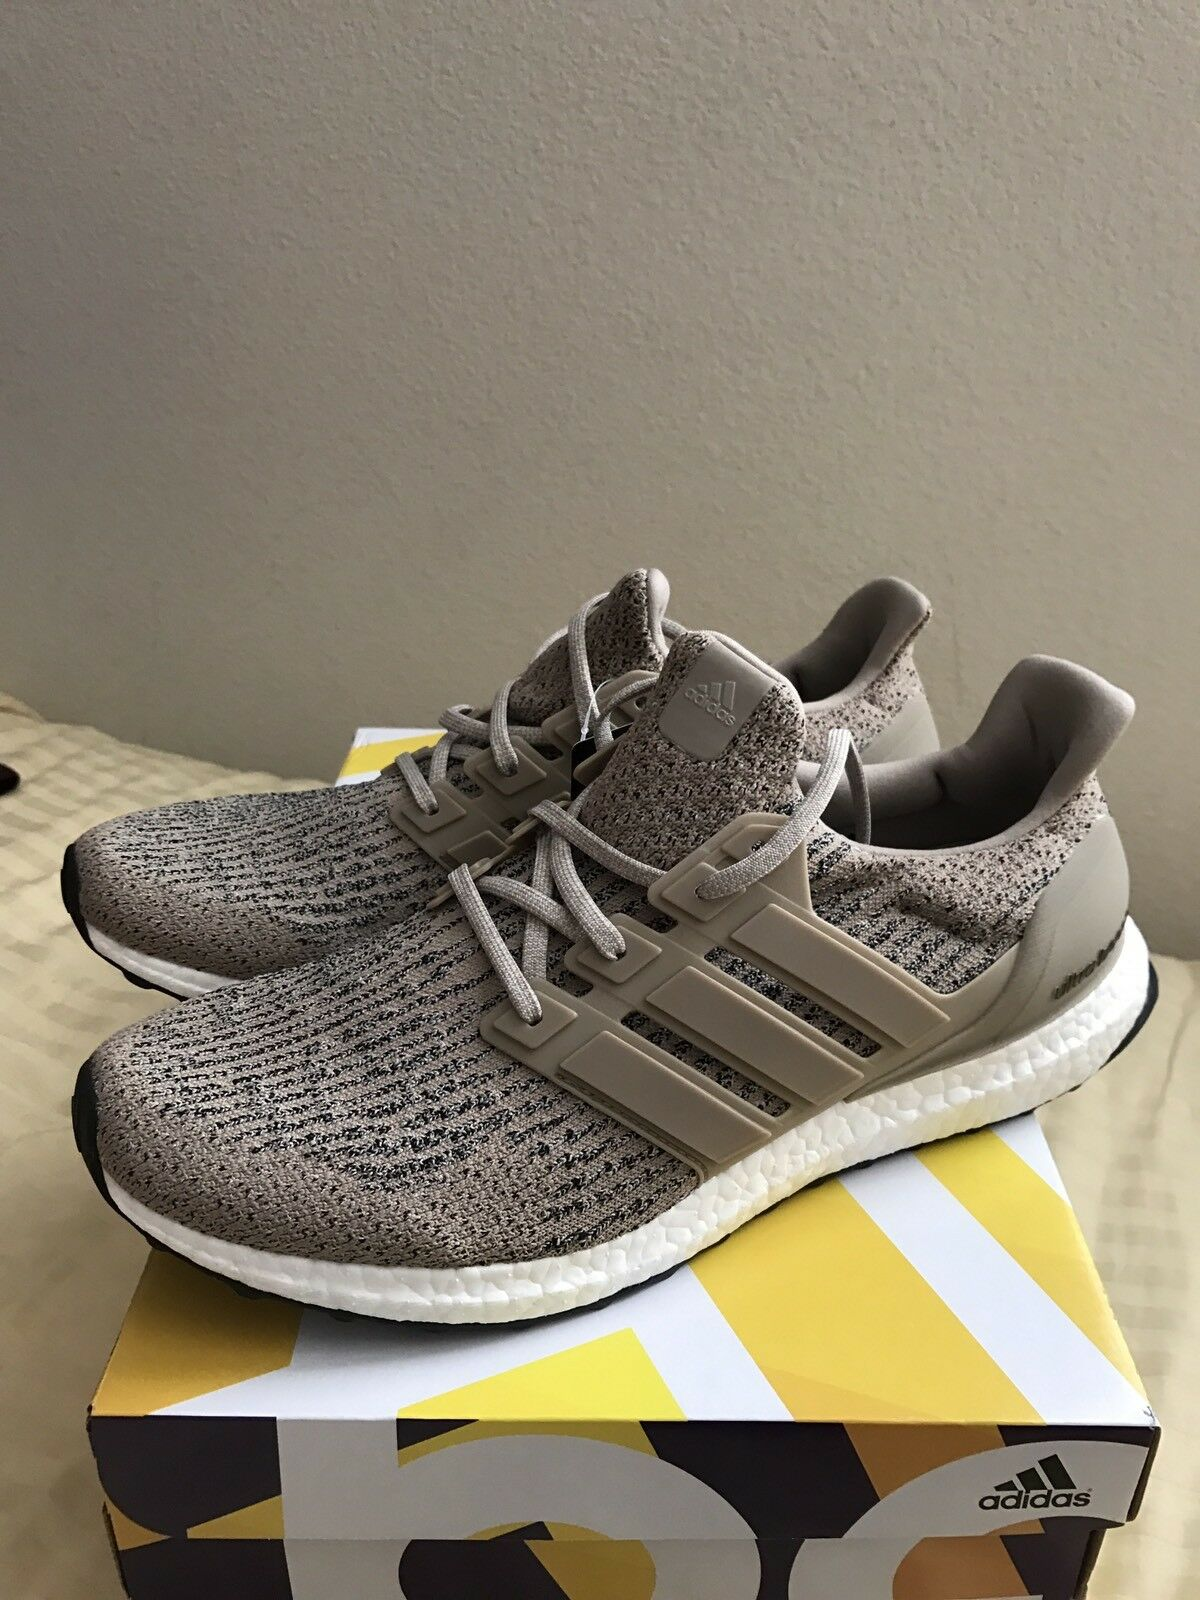 2018 Adidas ultra Boost 3.0 Trace es Khaki tan cg3039 hombres es Trace comodo e80bf9